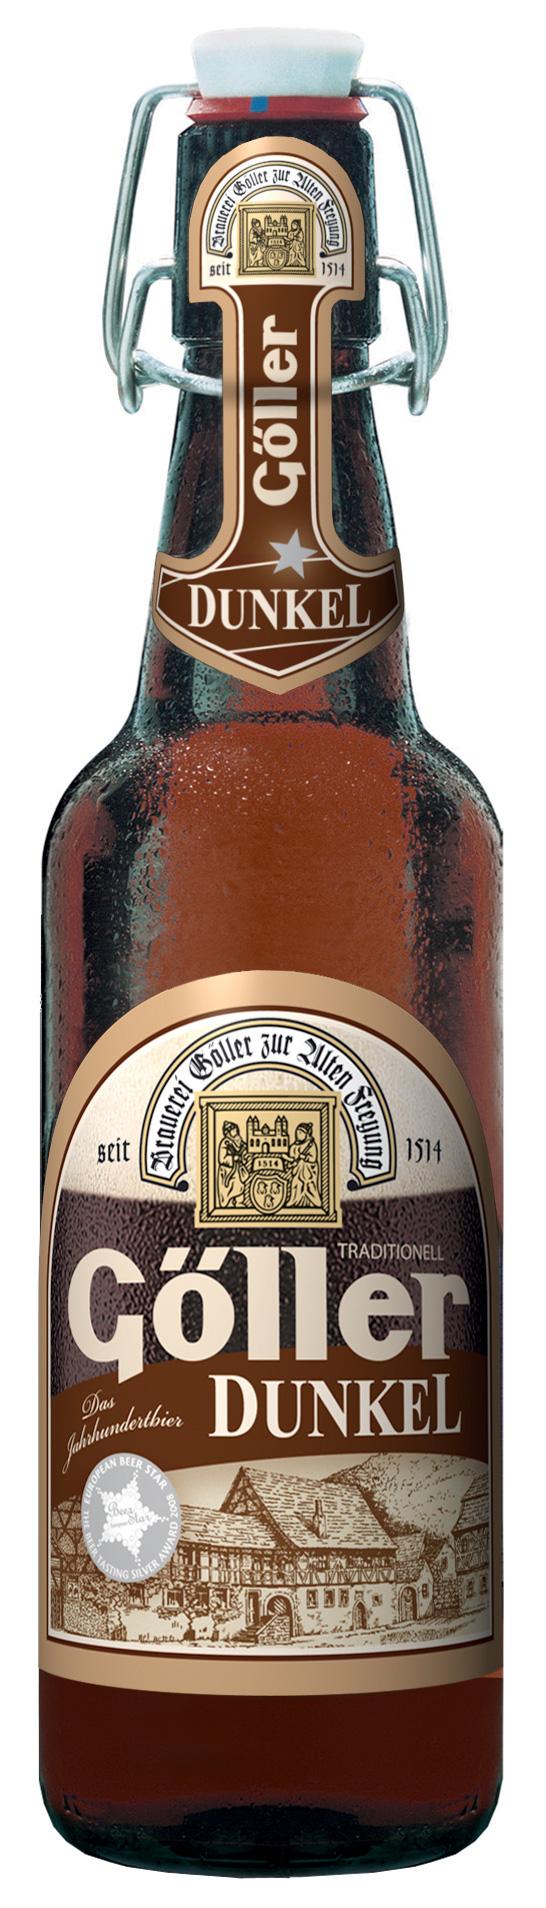 Dunkel Brauerei Göller